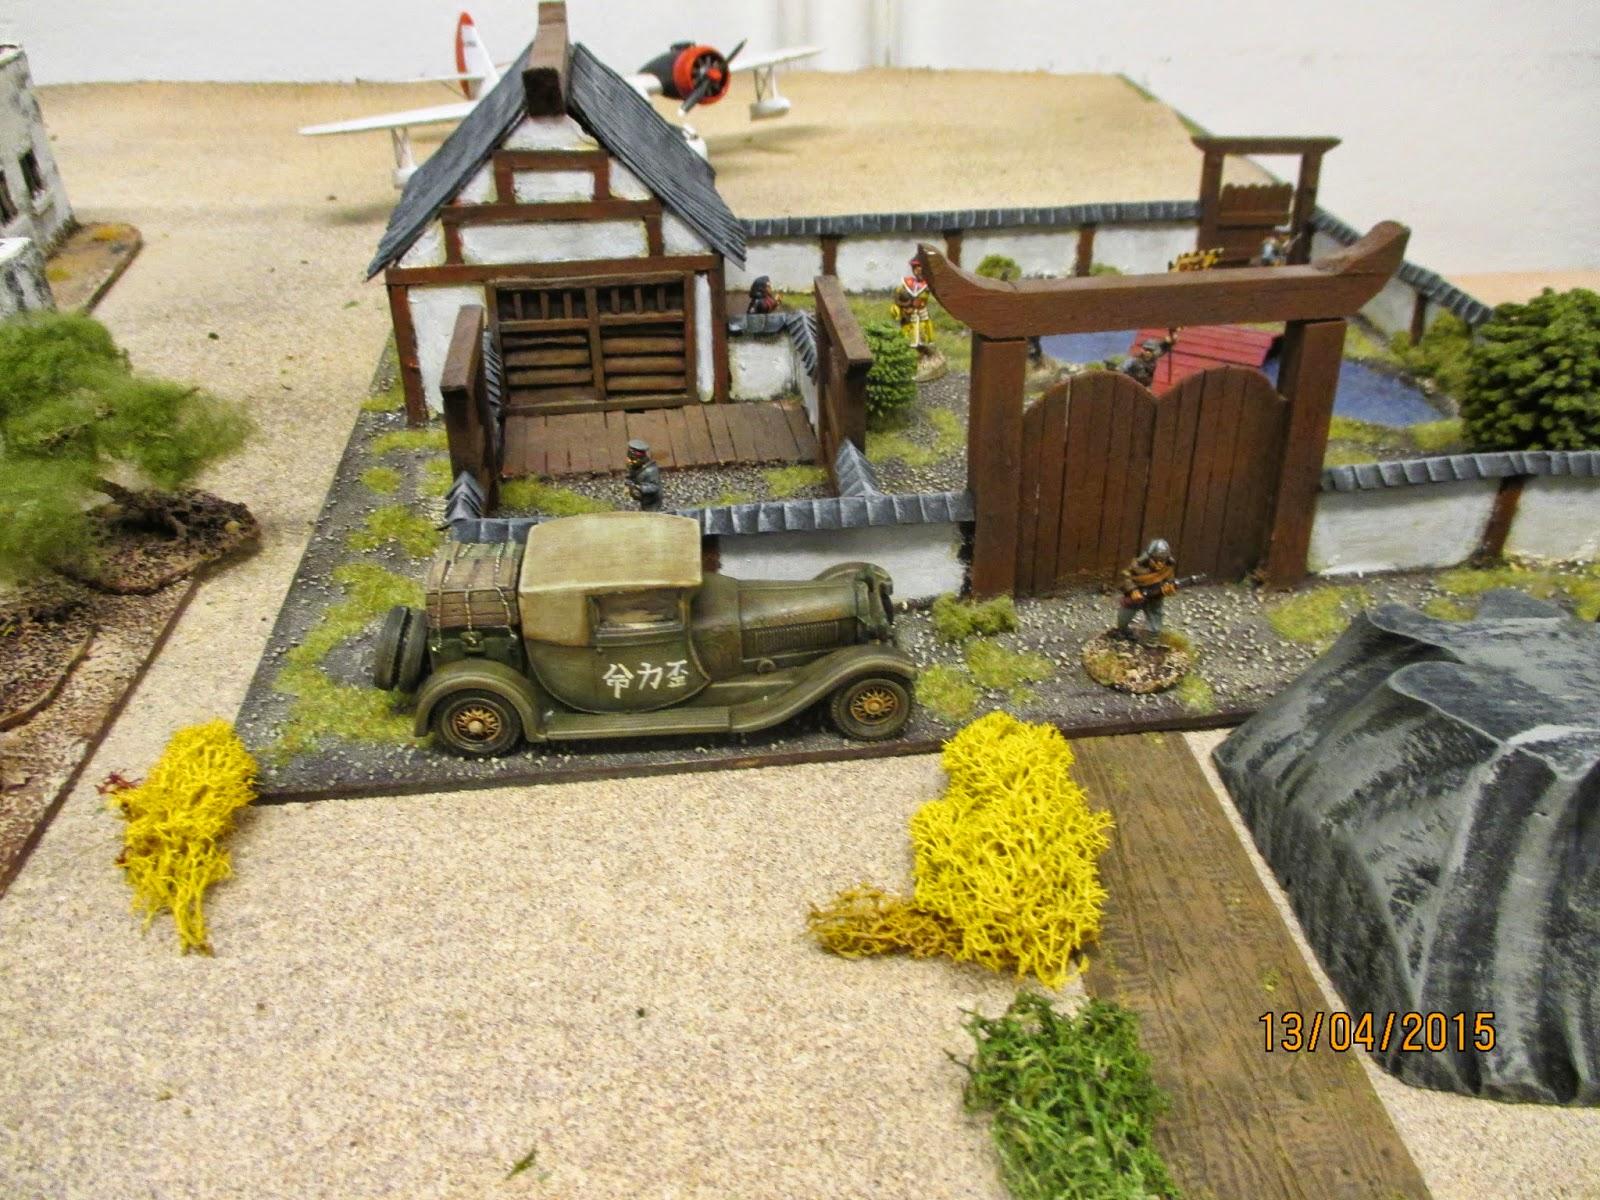 Davy Jone's Locker - best in miniature wargaming